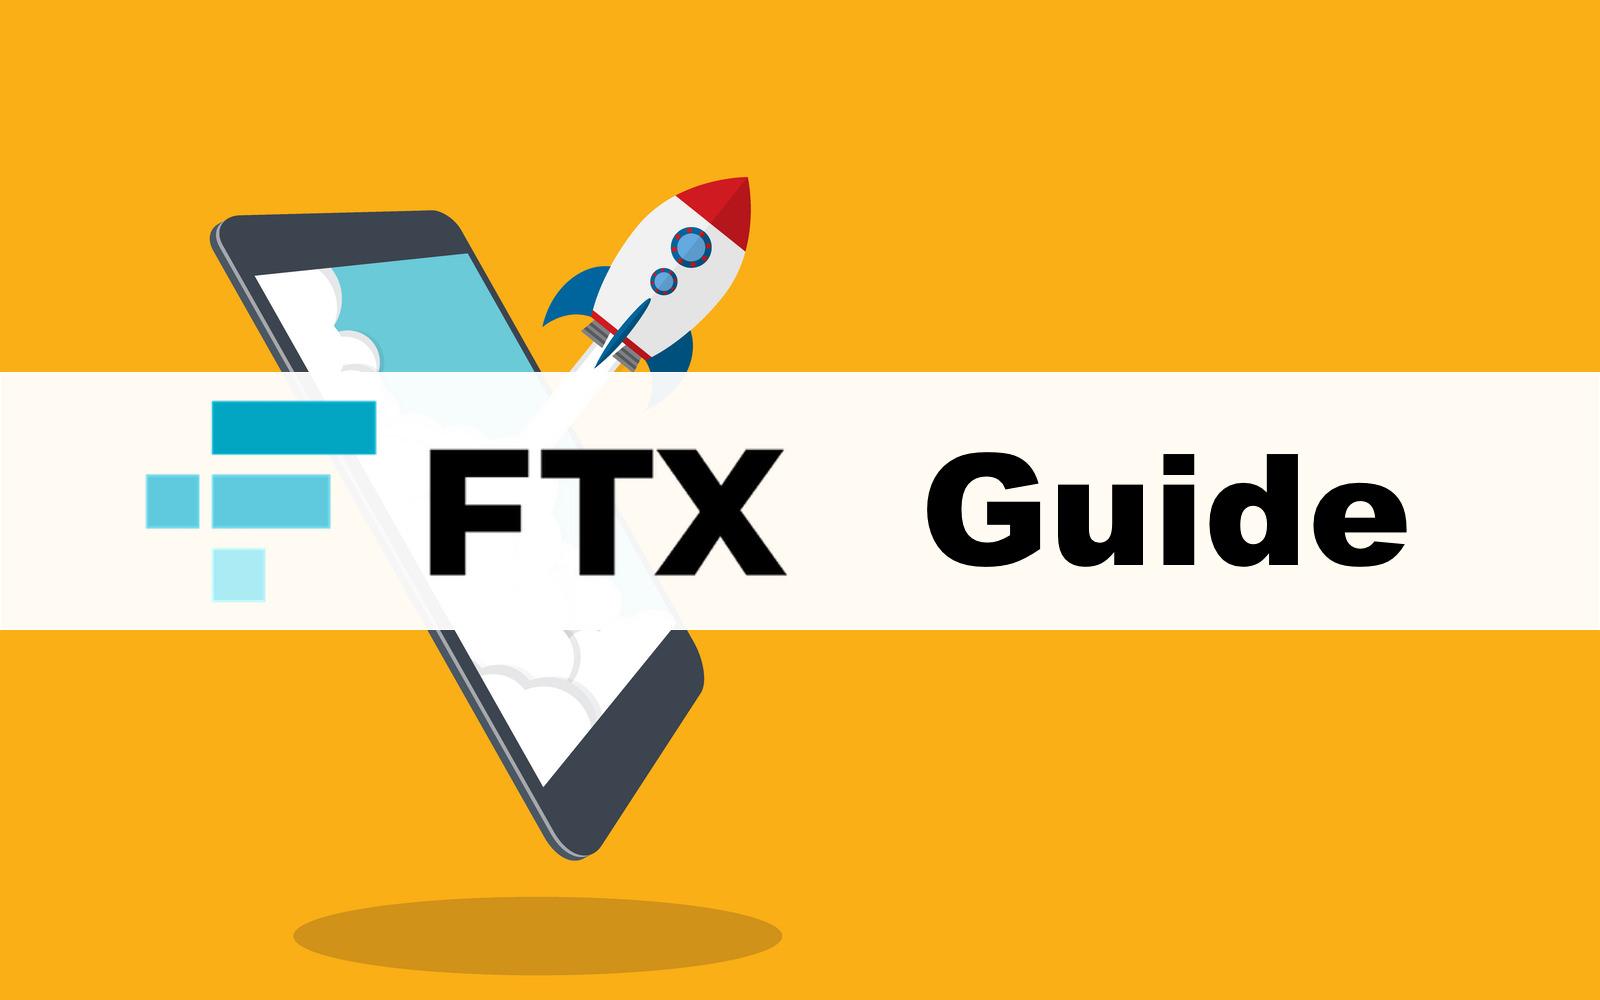 FTXの登録方法|アルトコイン商品の特徴や使い方を全て解説!